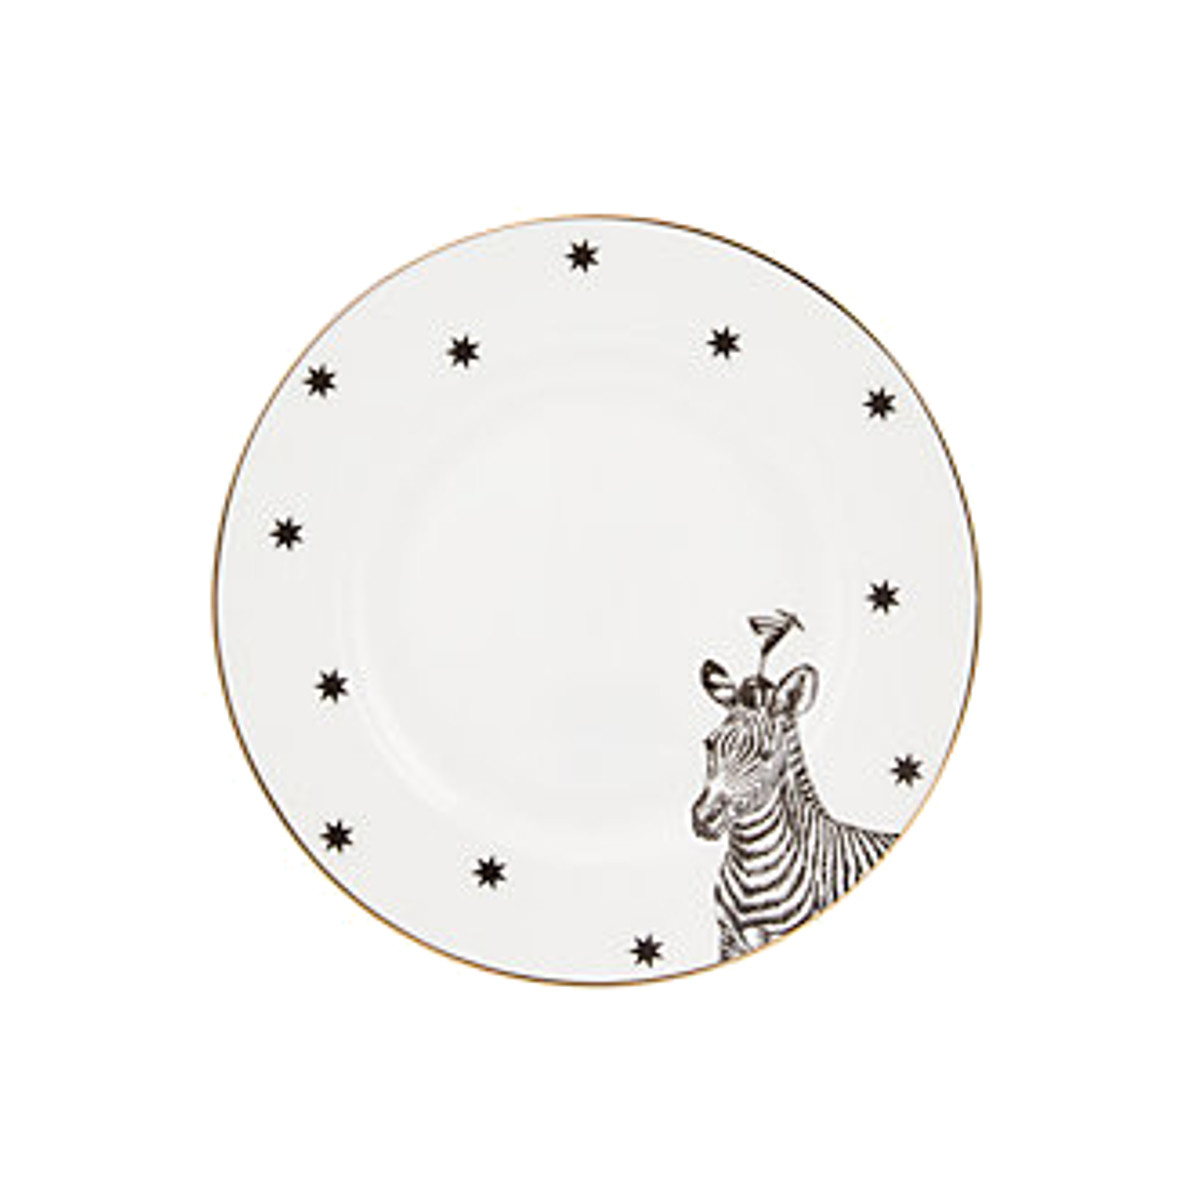 Yvonne Ellen London Monochrome 2-er Set Teller Ø 16 cm - Zebra Motiv - Bone China Porzellan